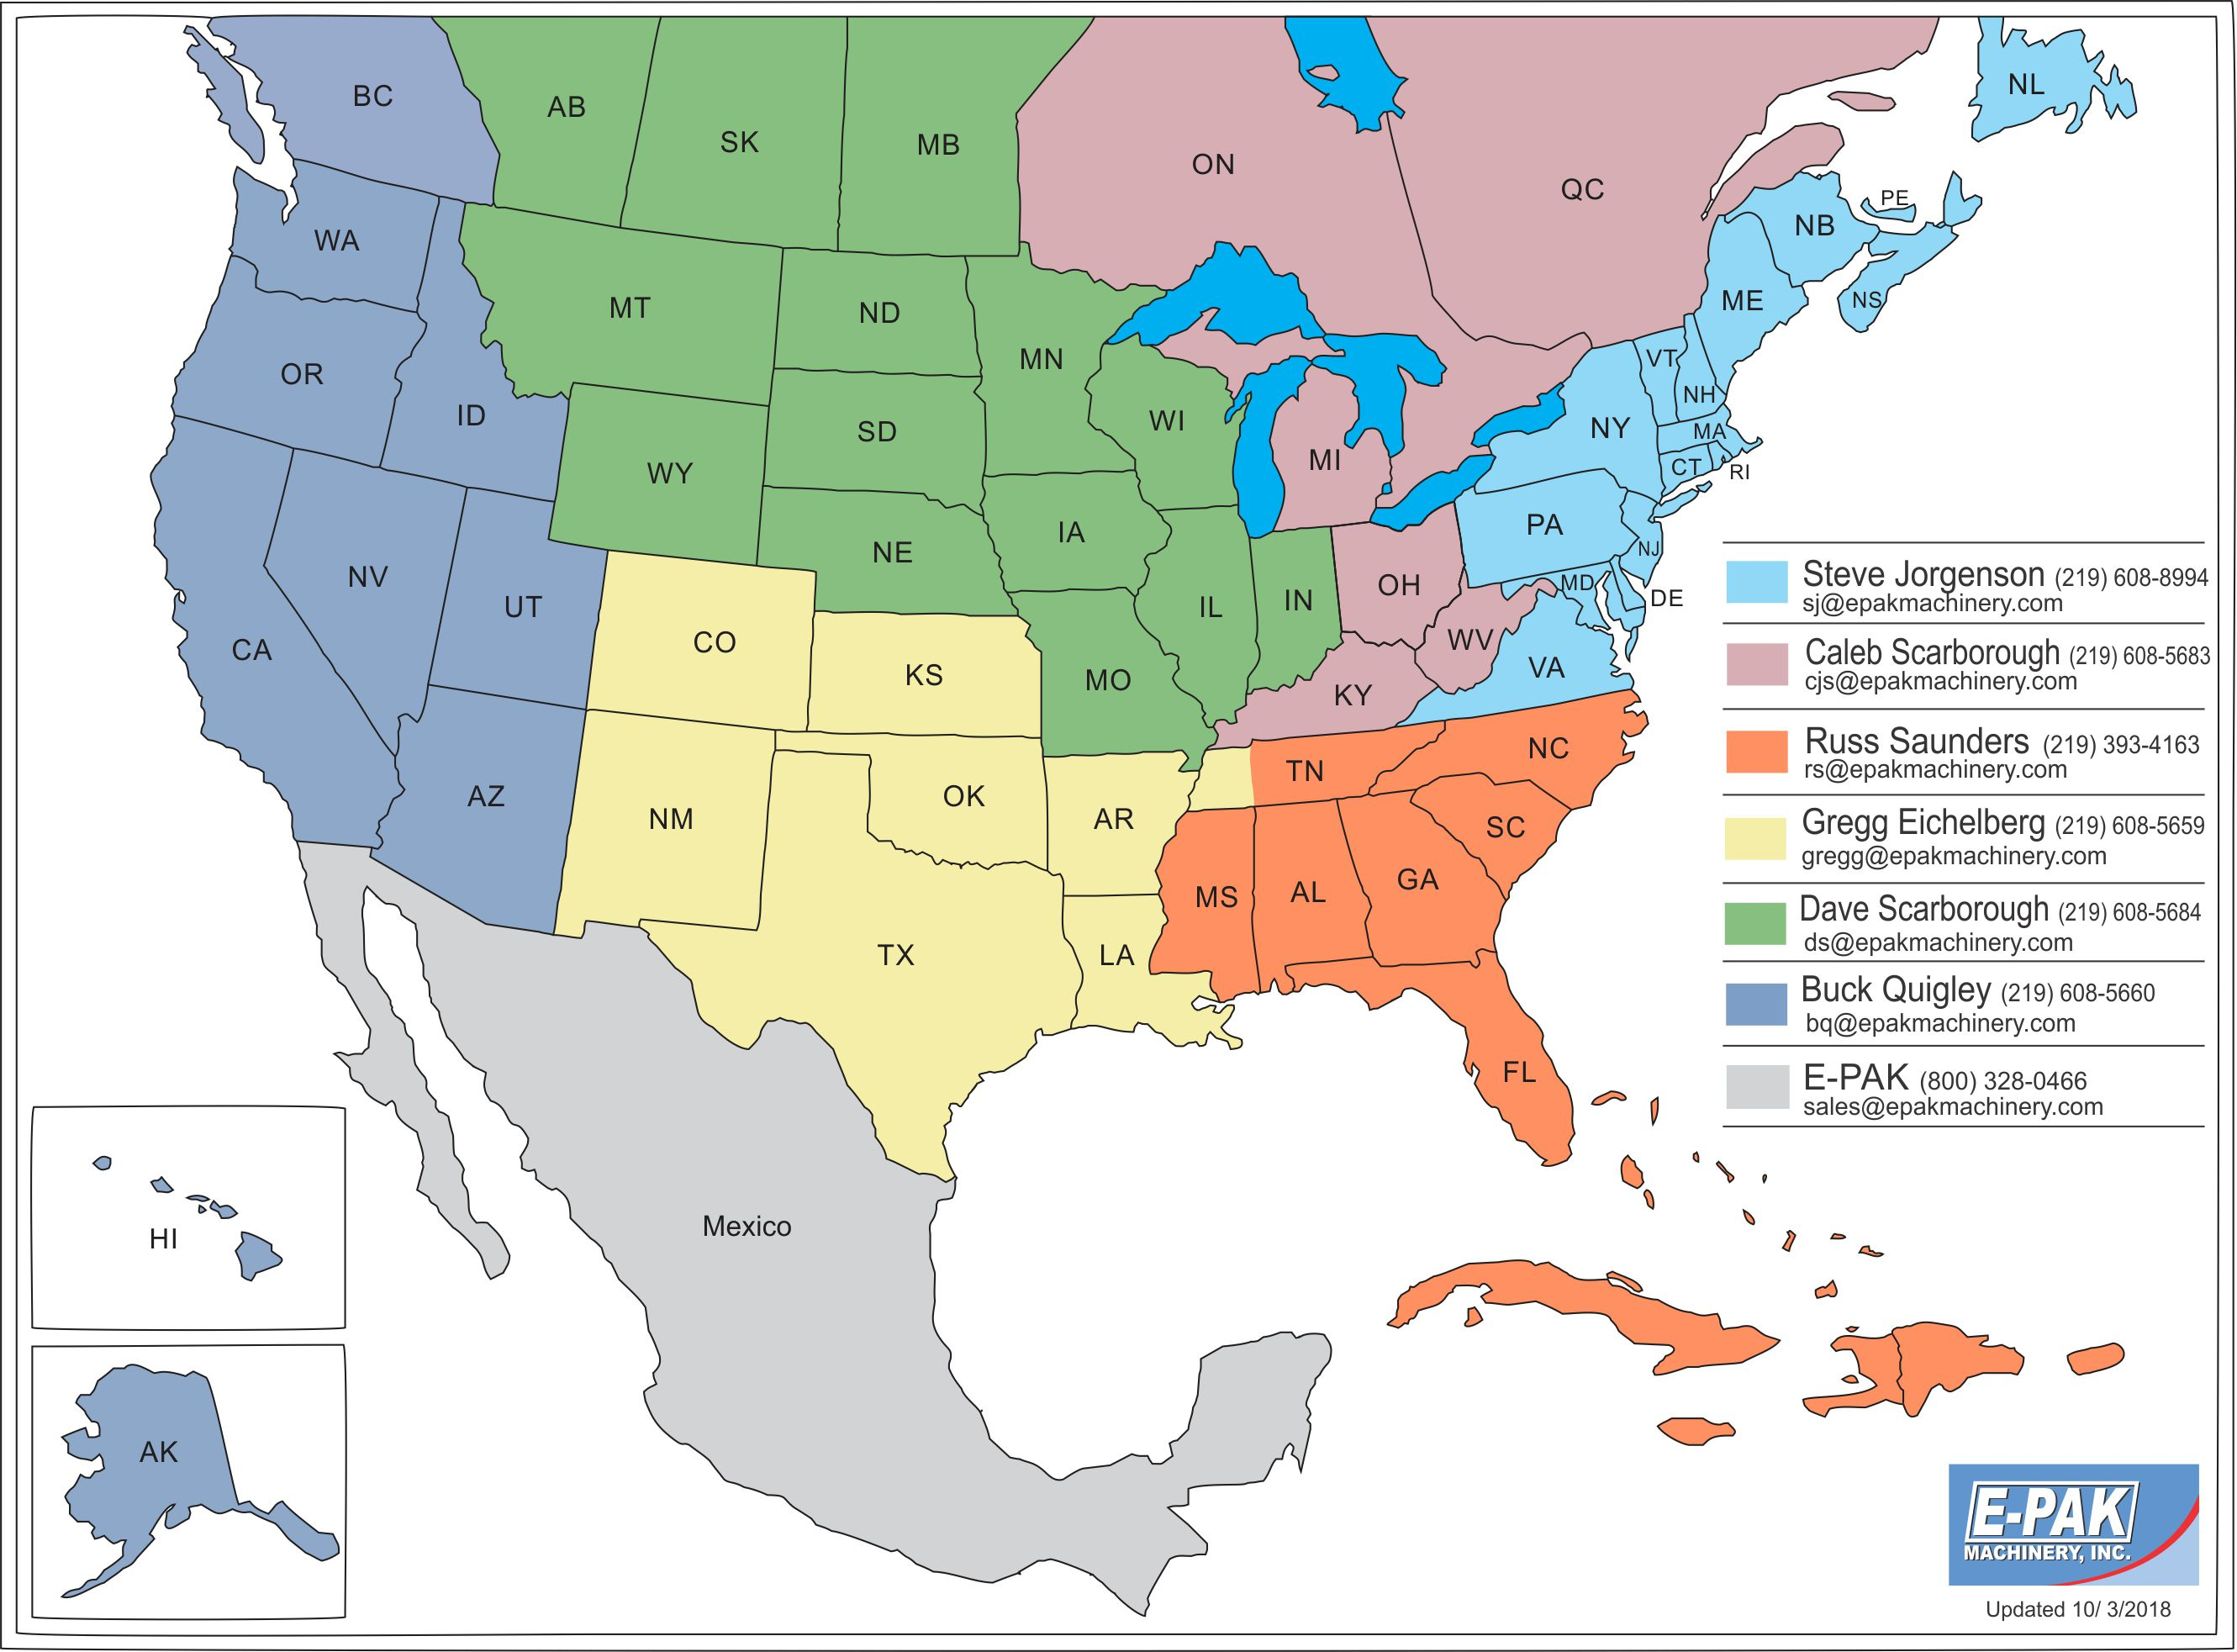 e-pak-sales-territory-map-no-area-codes-10-3-18.jpg